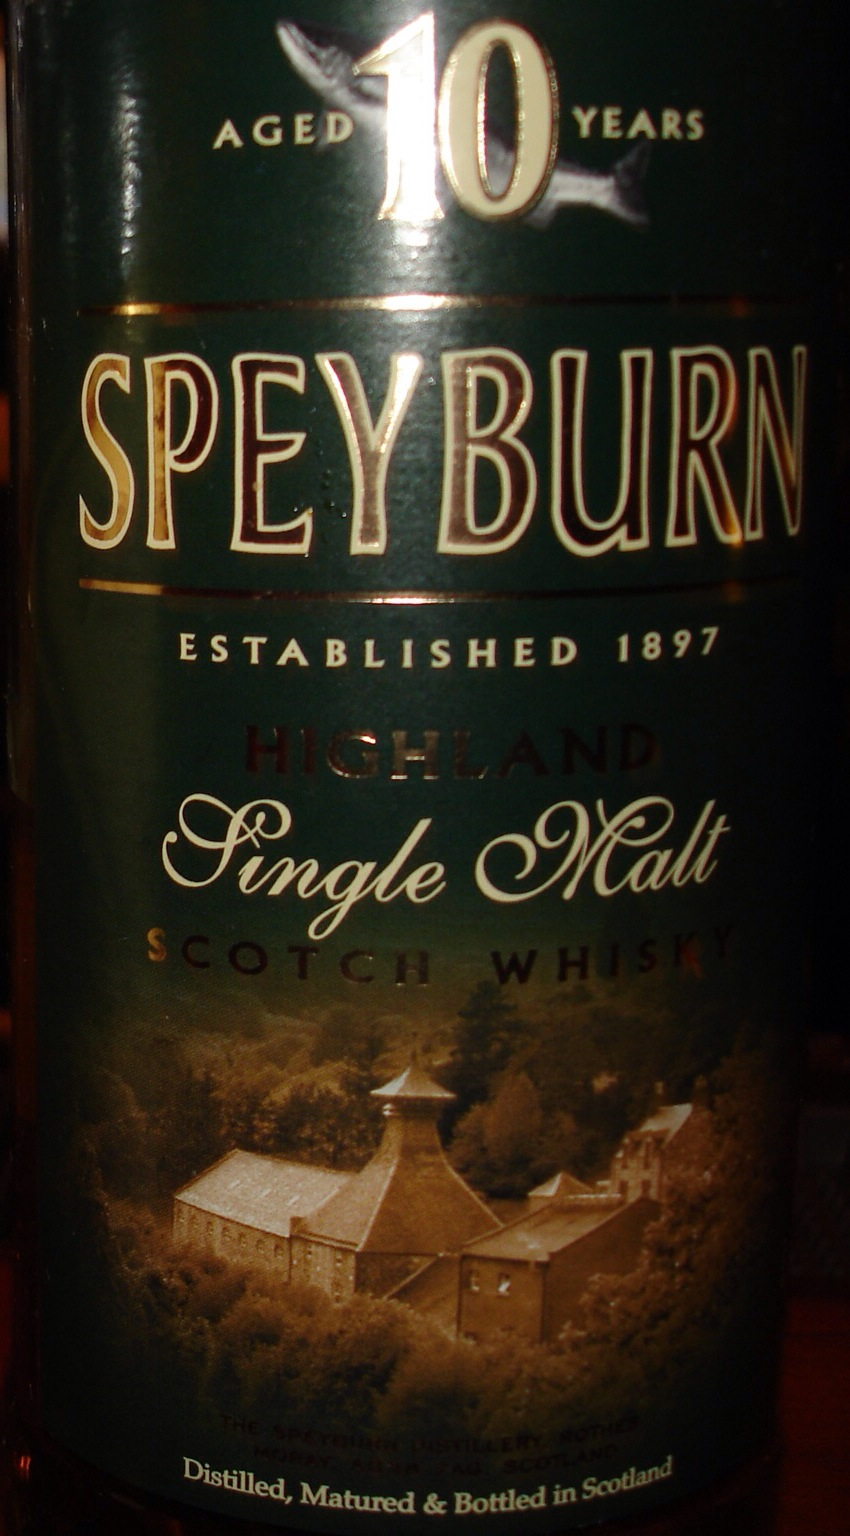 Scotch -cropped (3).JPG